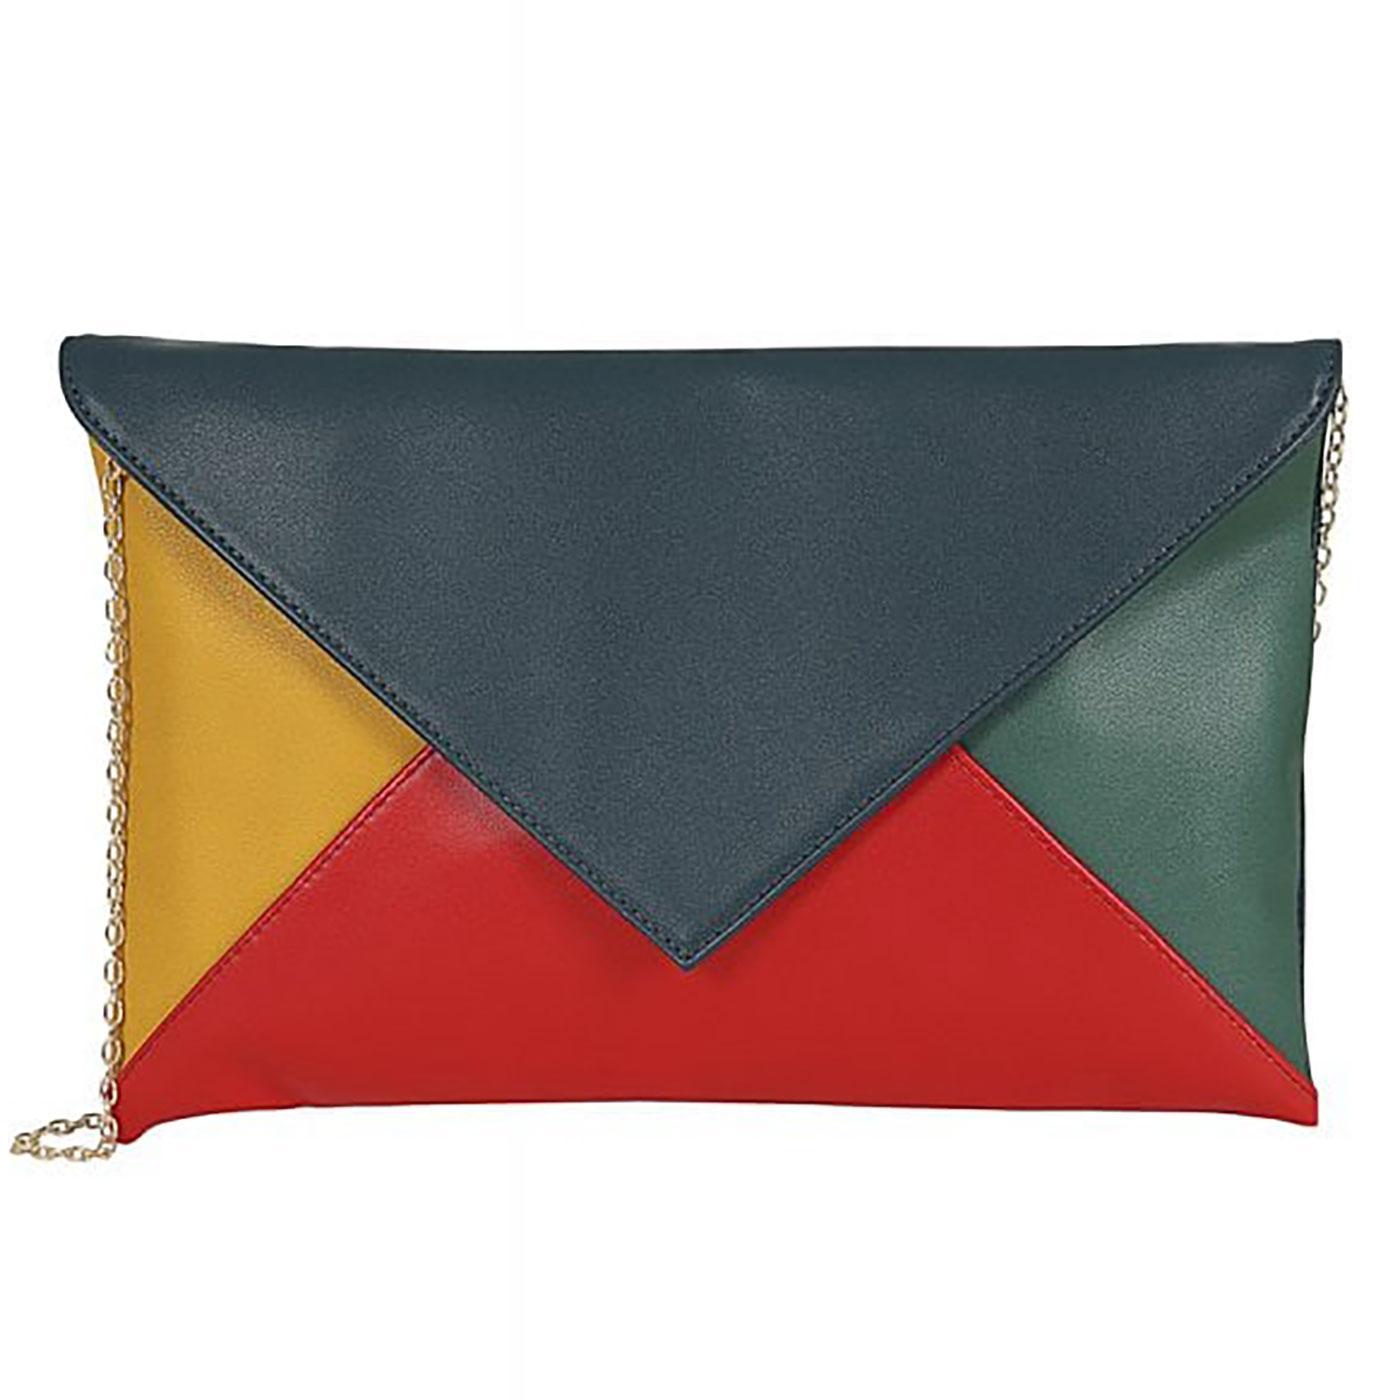 Lesly COLLECTIF Summer Colour Block Clutch Bag